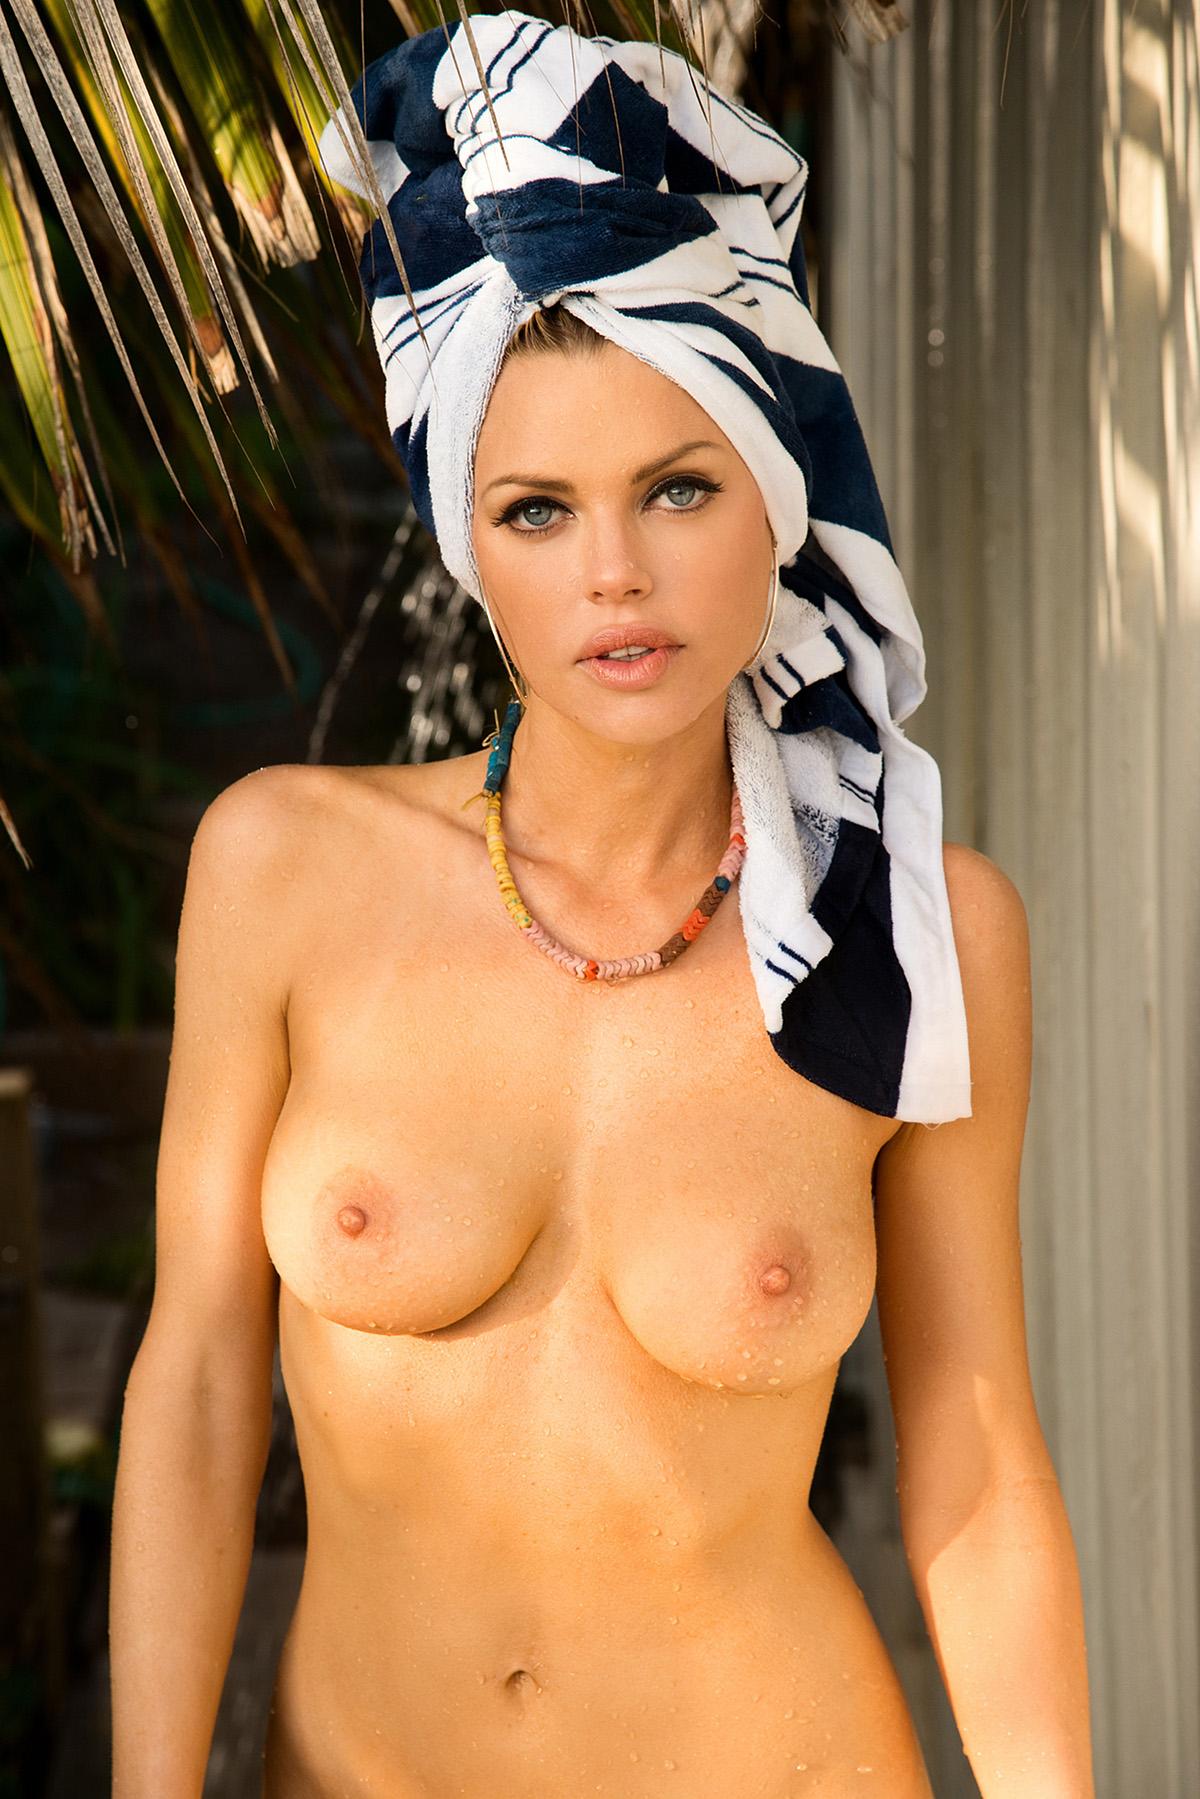 Sophie monk celebrity nude gallery